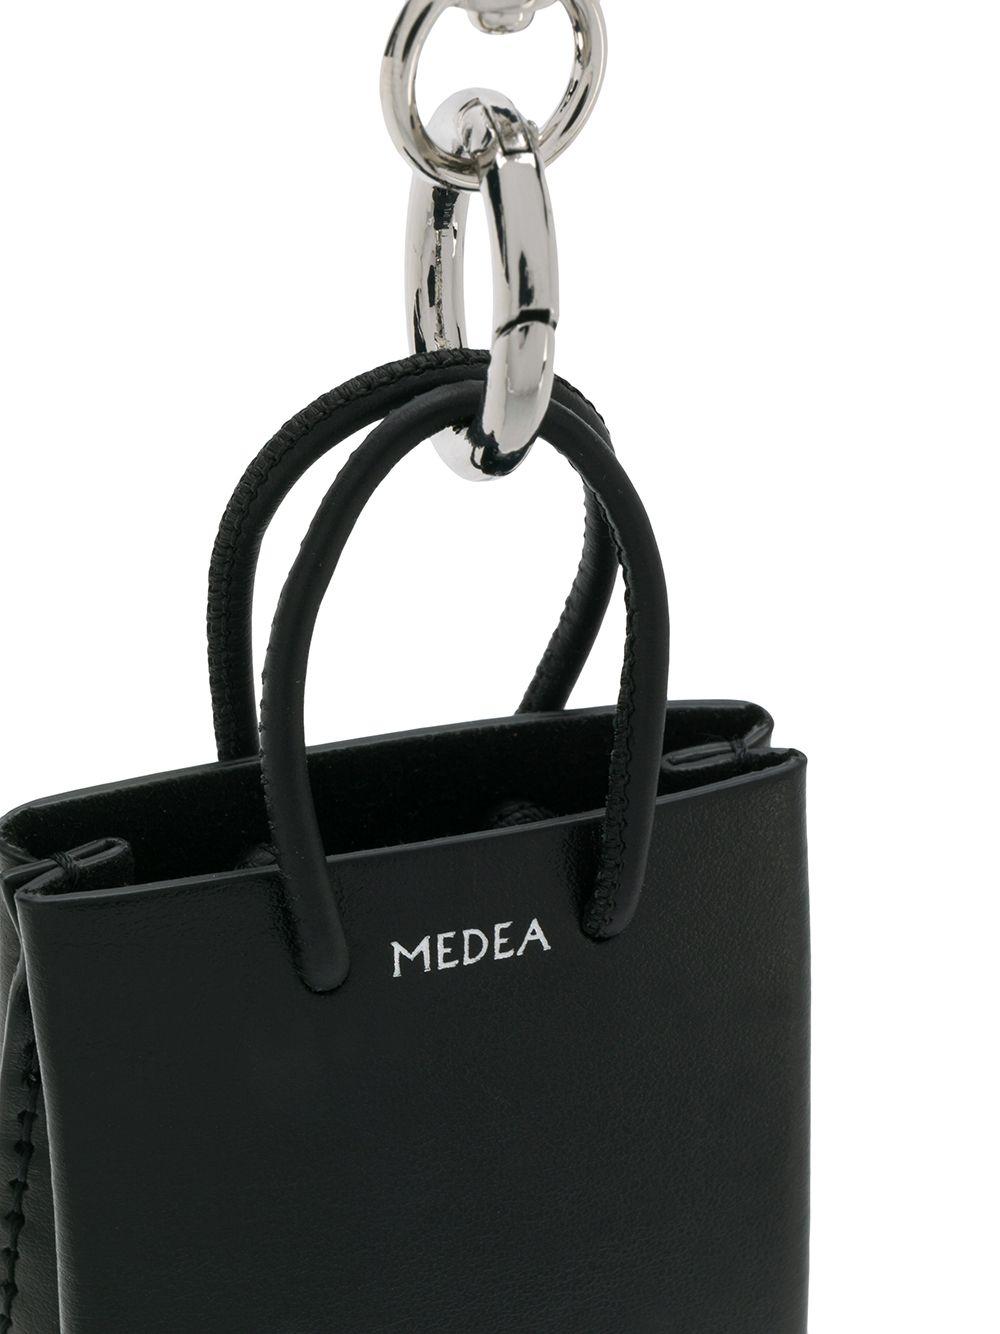 Medea | брелок в виде сумки | Clouty